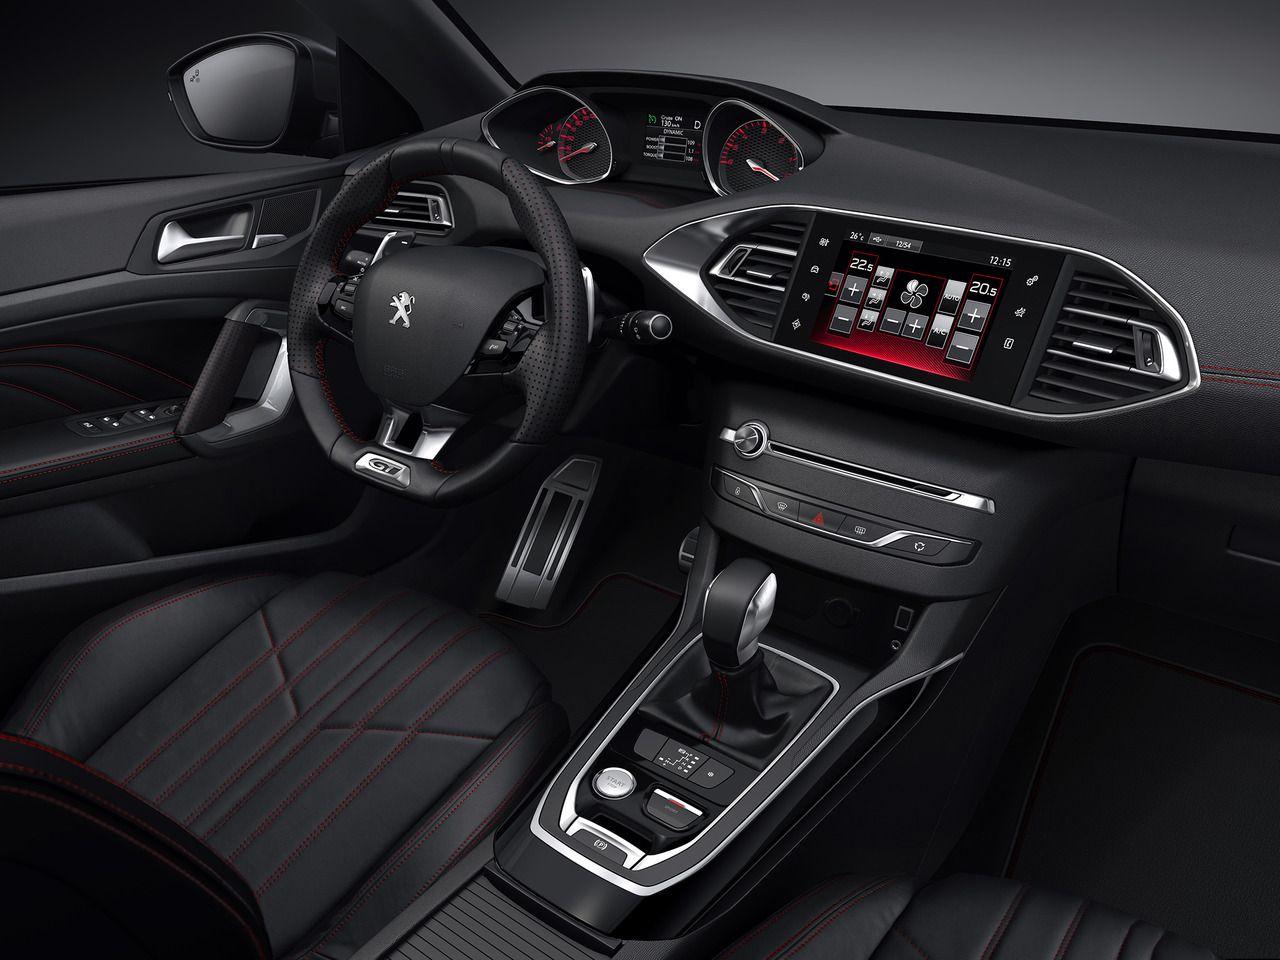 Car Interiors 2014 Peugeot 308 Gt Peugeot 308 Peugeot Sports Cars Mustang